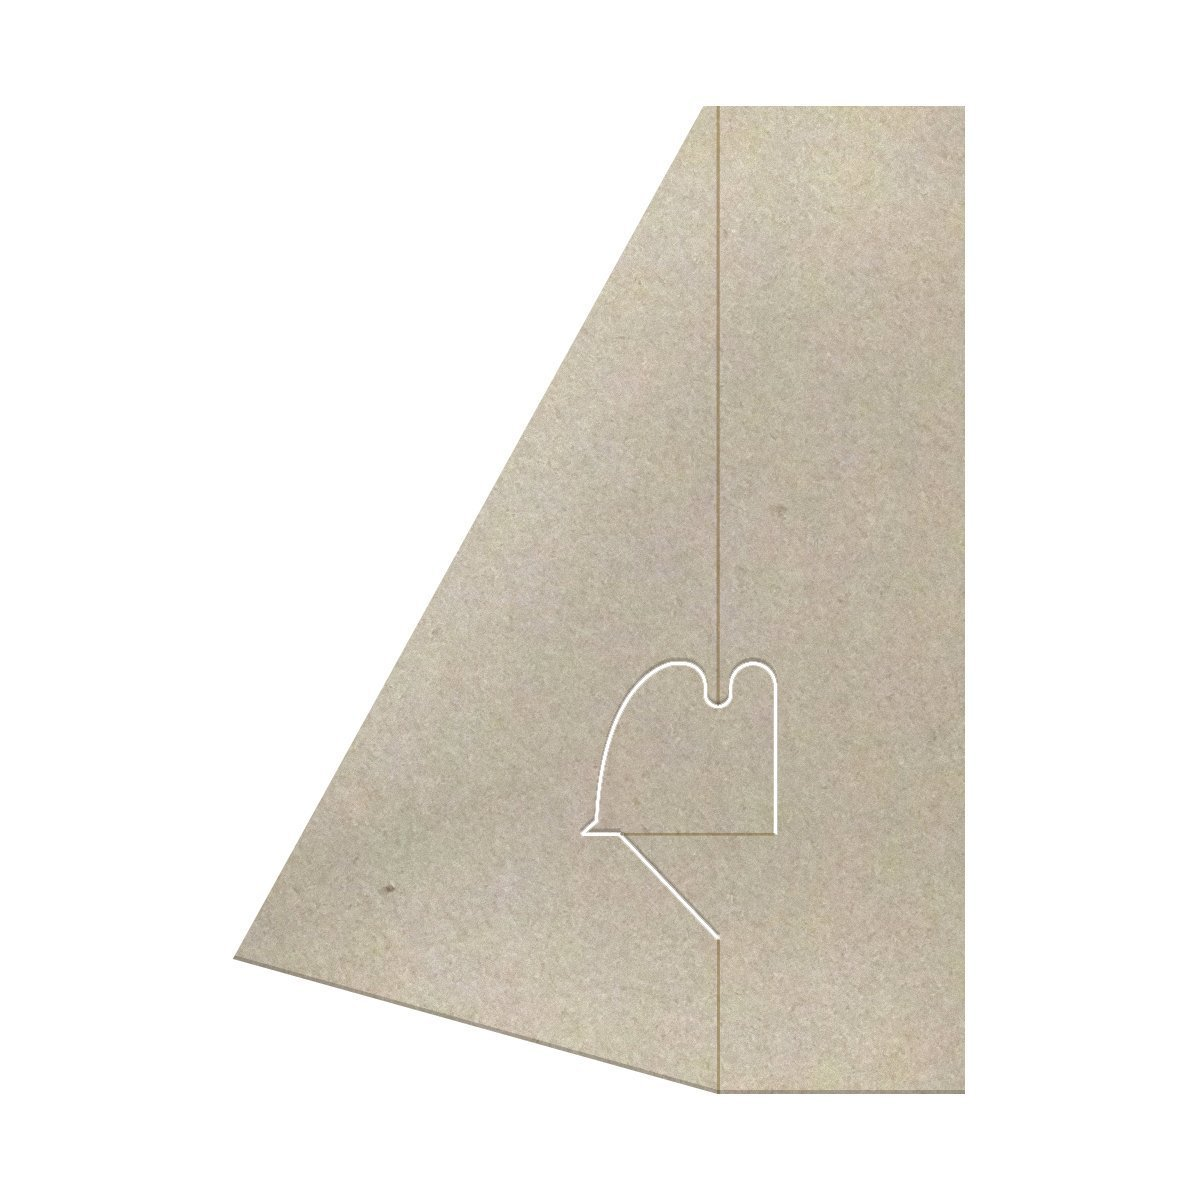 Chipboard - CO - Shobi's Card Stand (Medium) twin pack